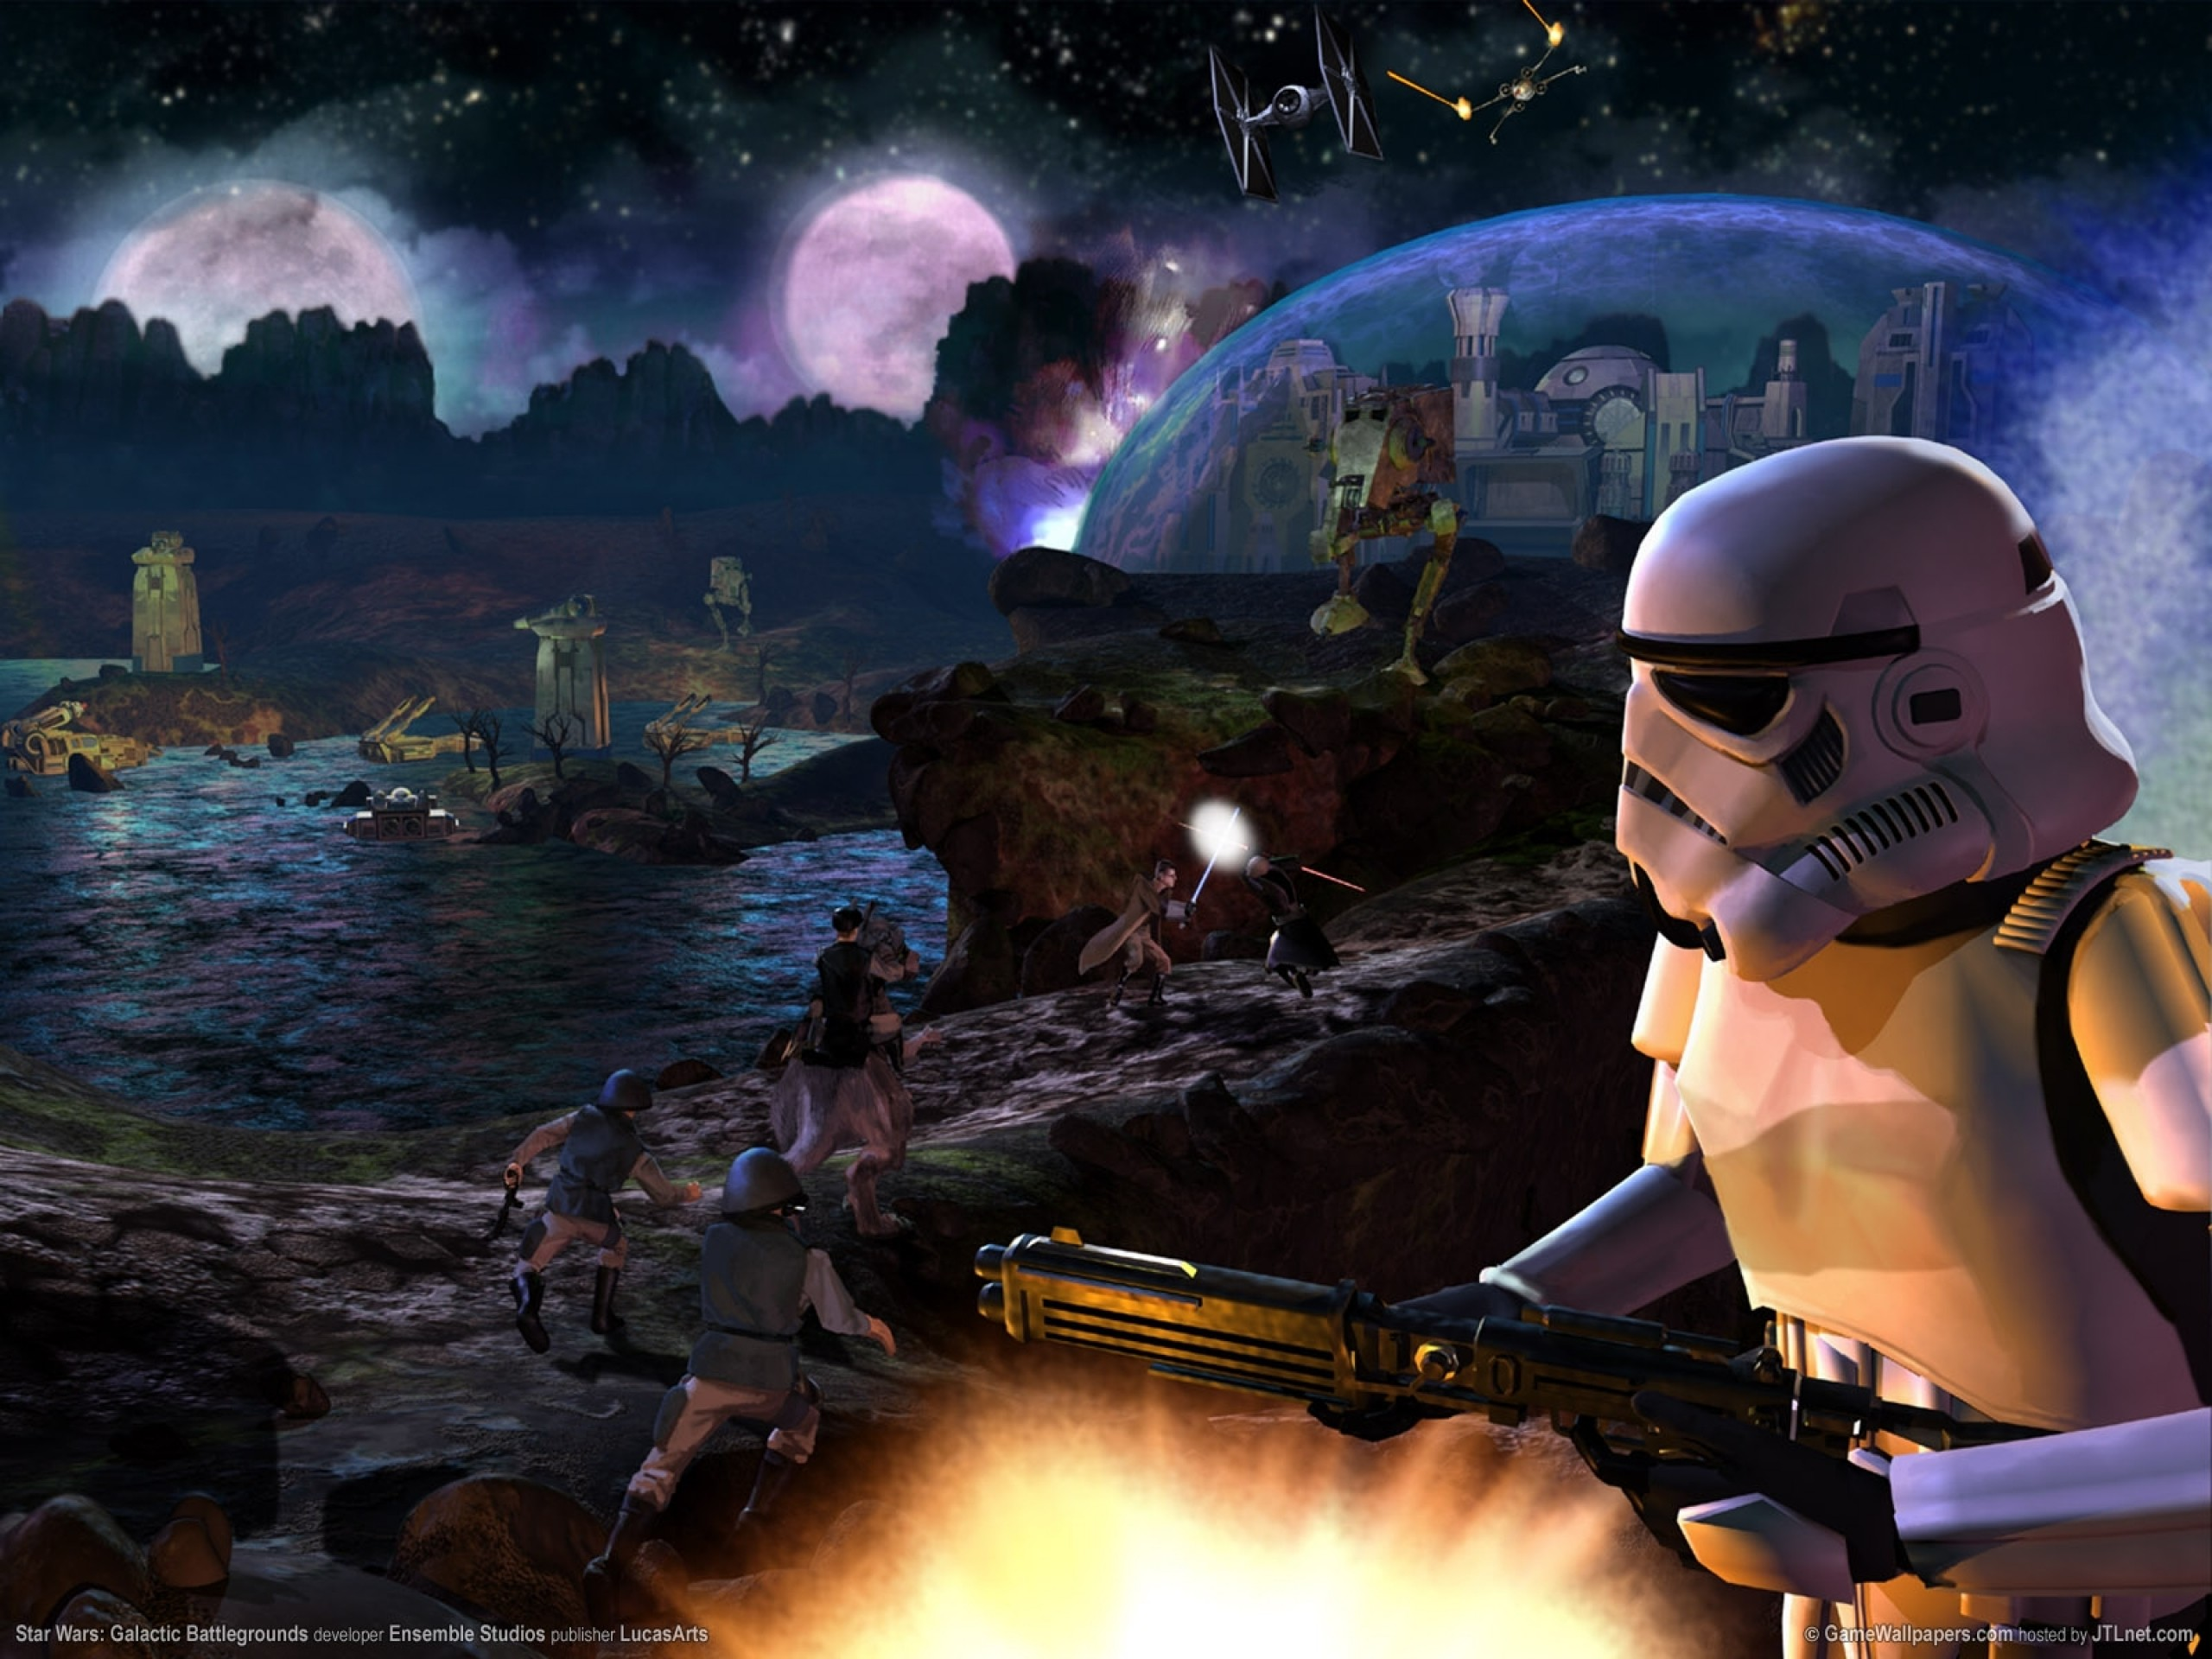 Star Wars Galaxies Wallpaper (51+ images)